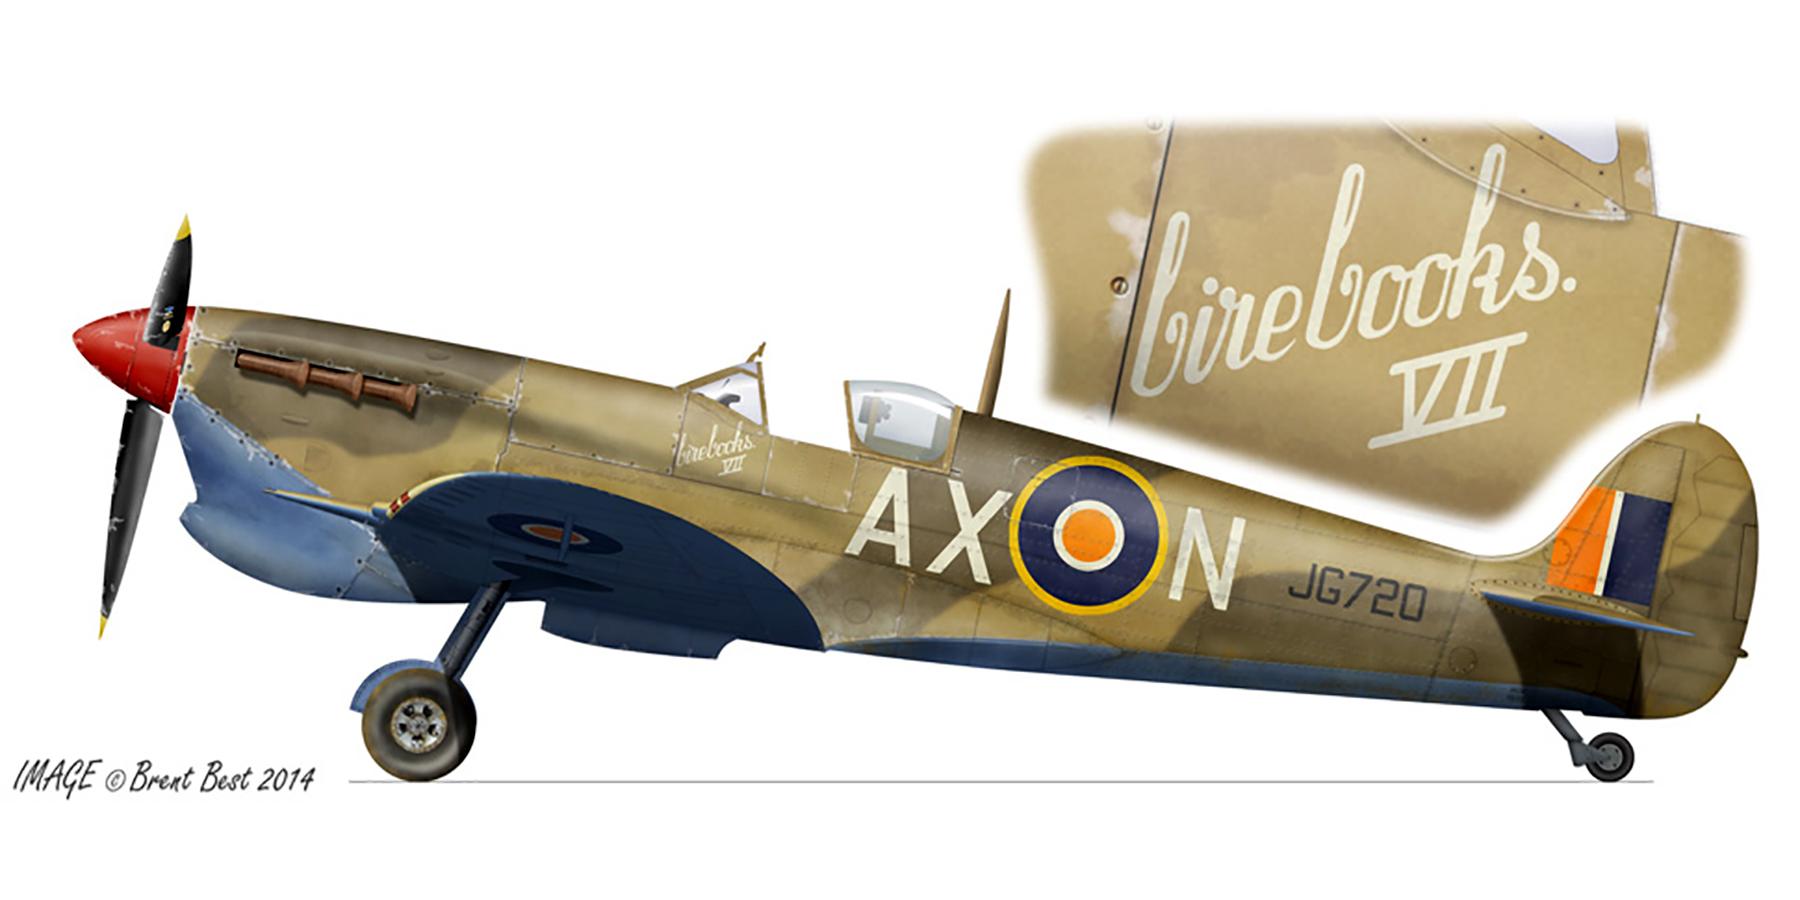 Spitfire MkVcTrop SAAF 1Sqn AXN Lt Robbie Robinson JG720 Ben Gardane Tunisia Jun 1943 0A